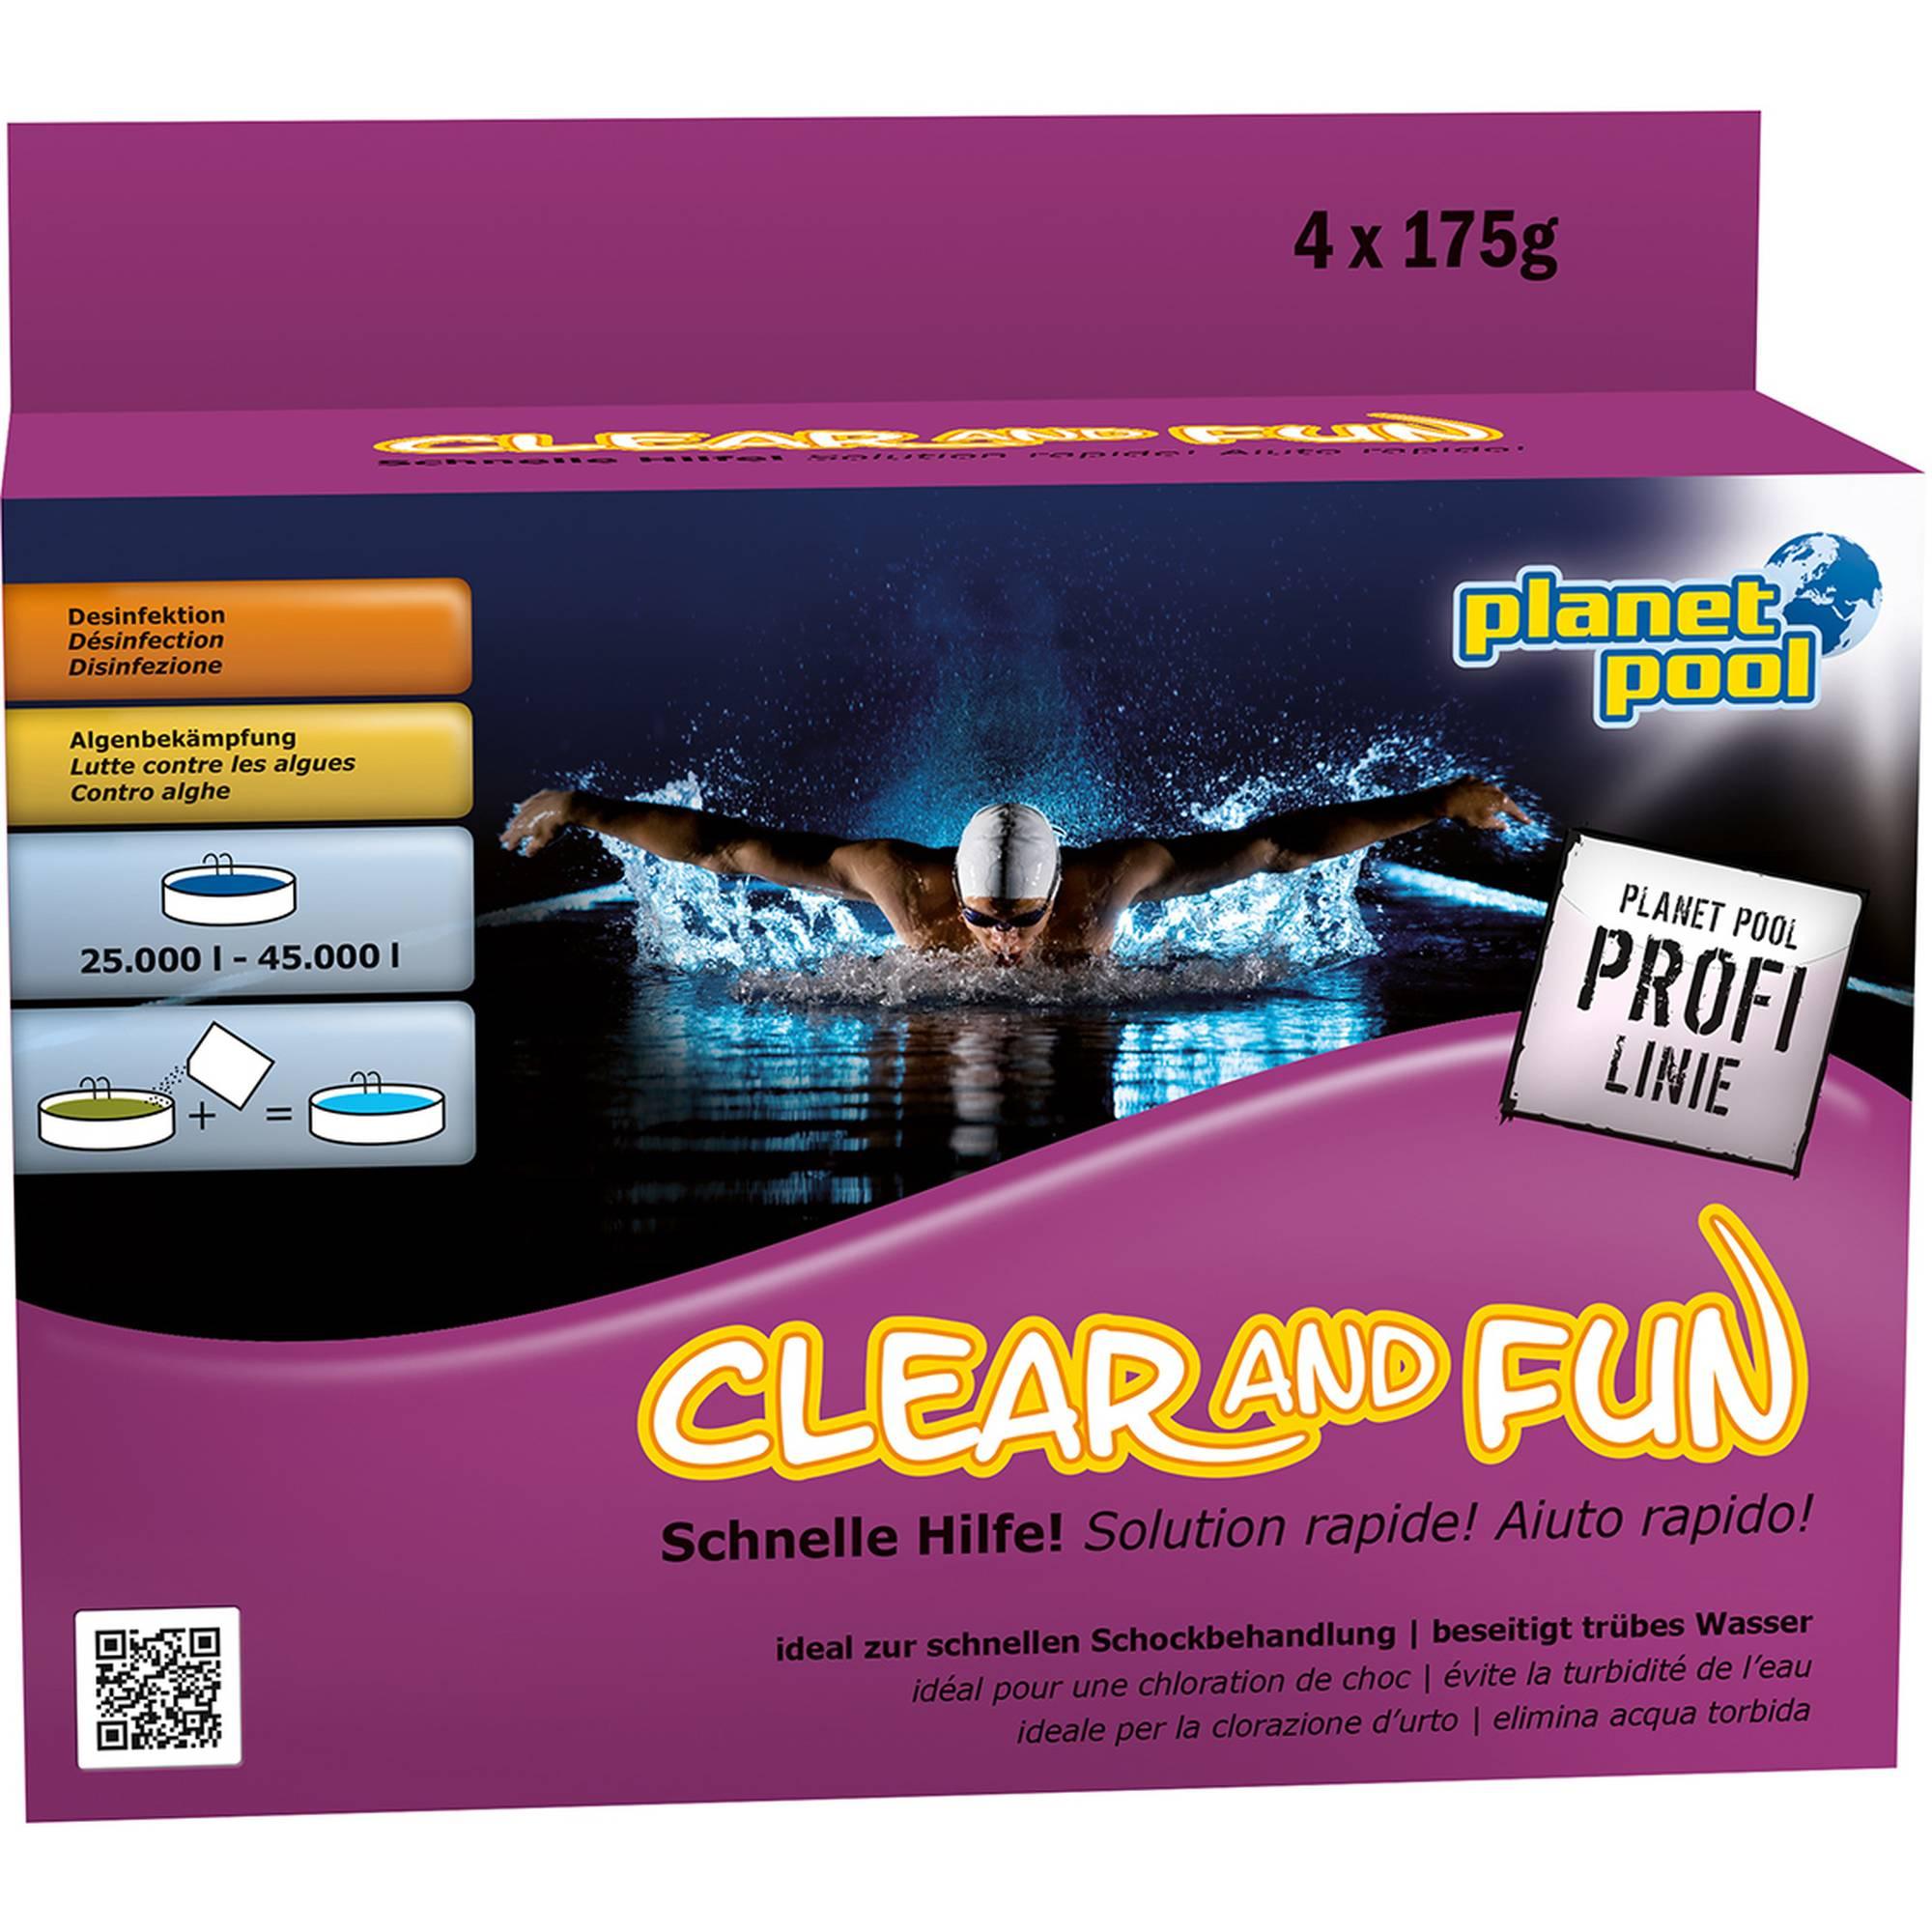 PLANET POOL - Profi Linie | Clear and Fun Big Wasserpflegeset